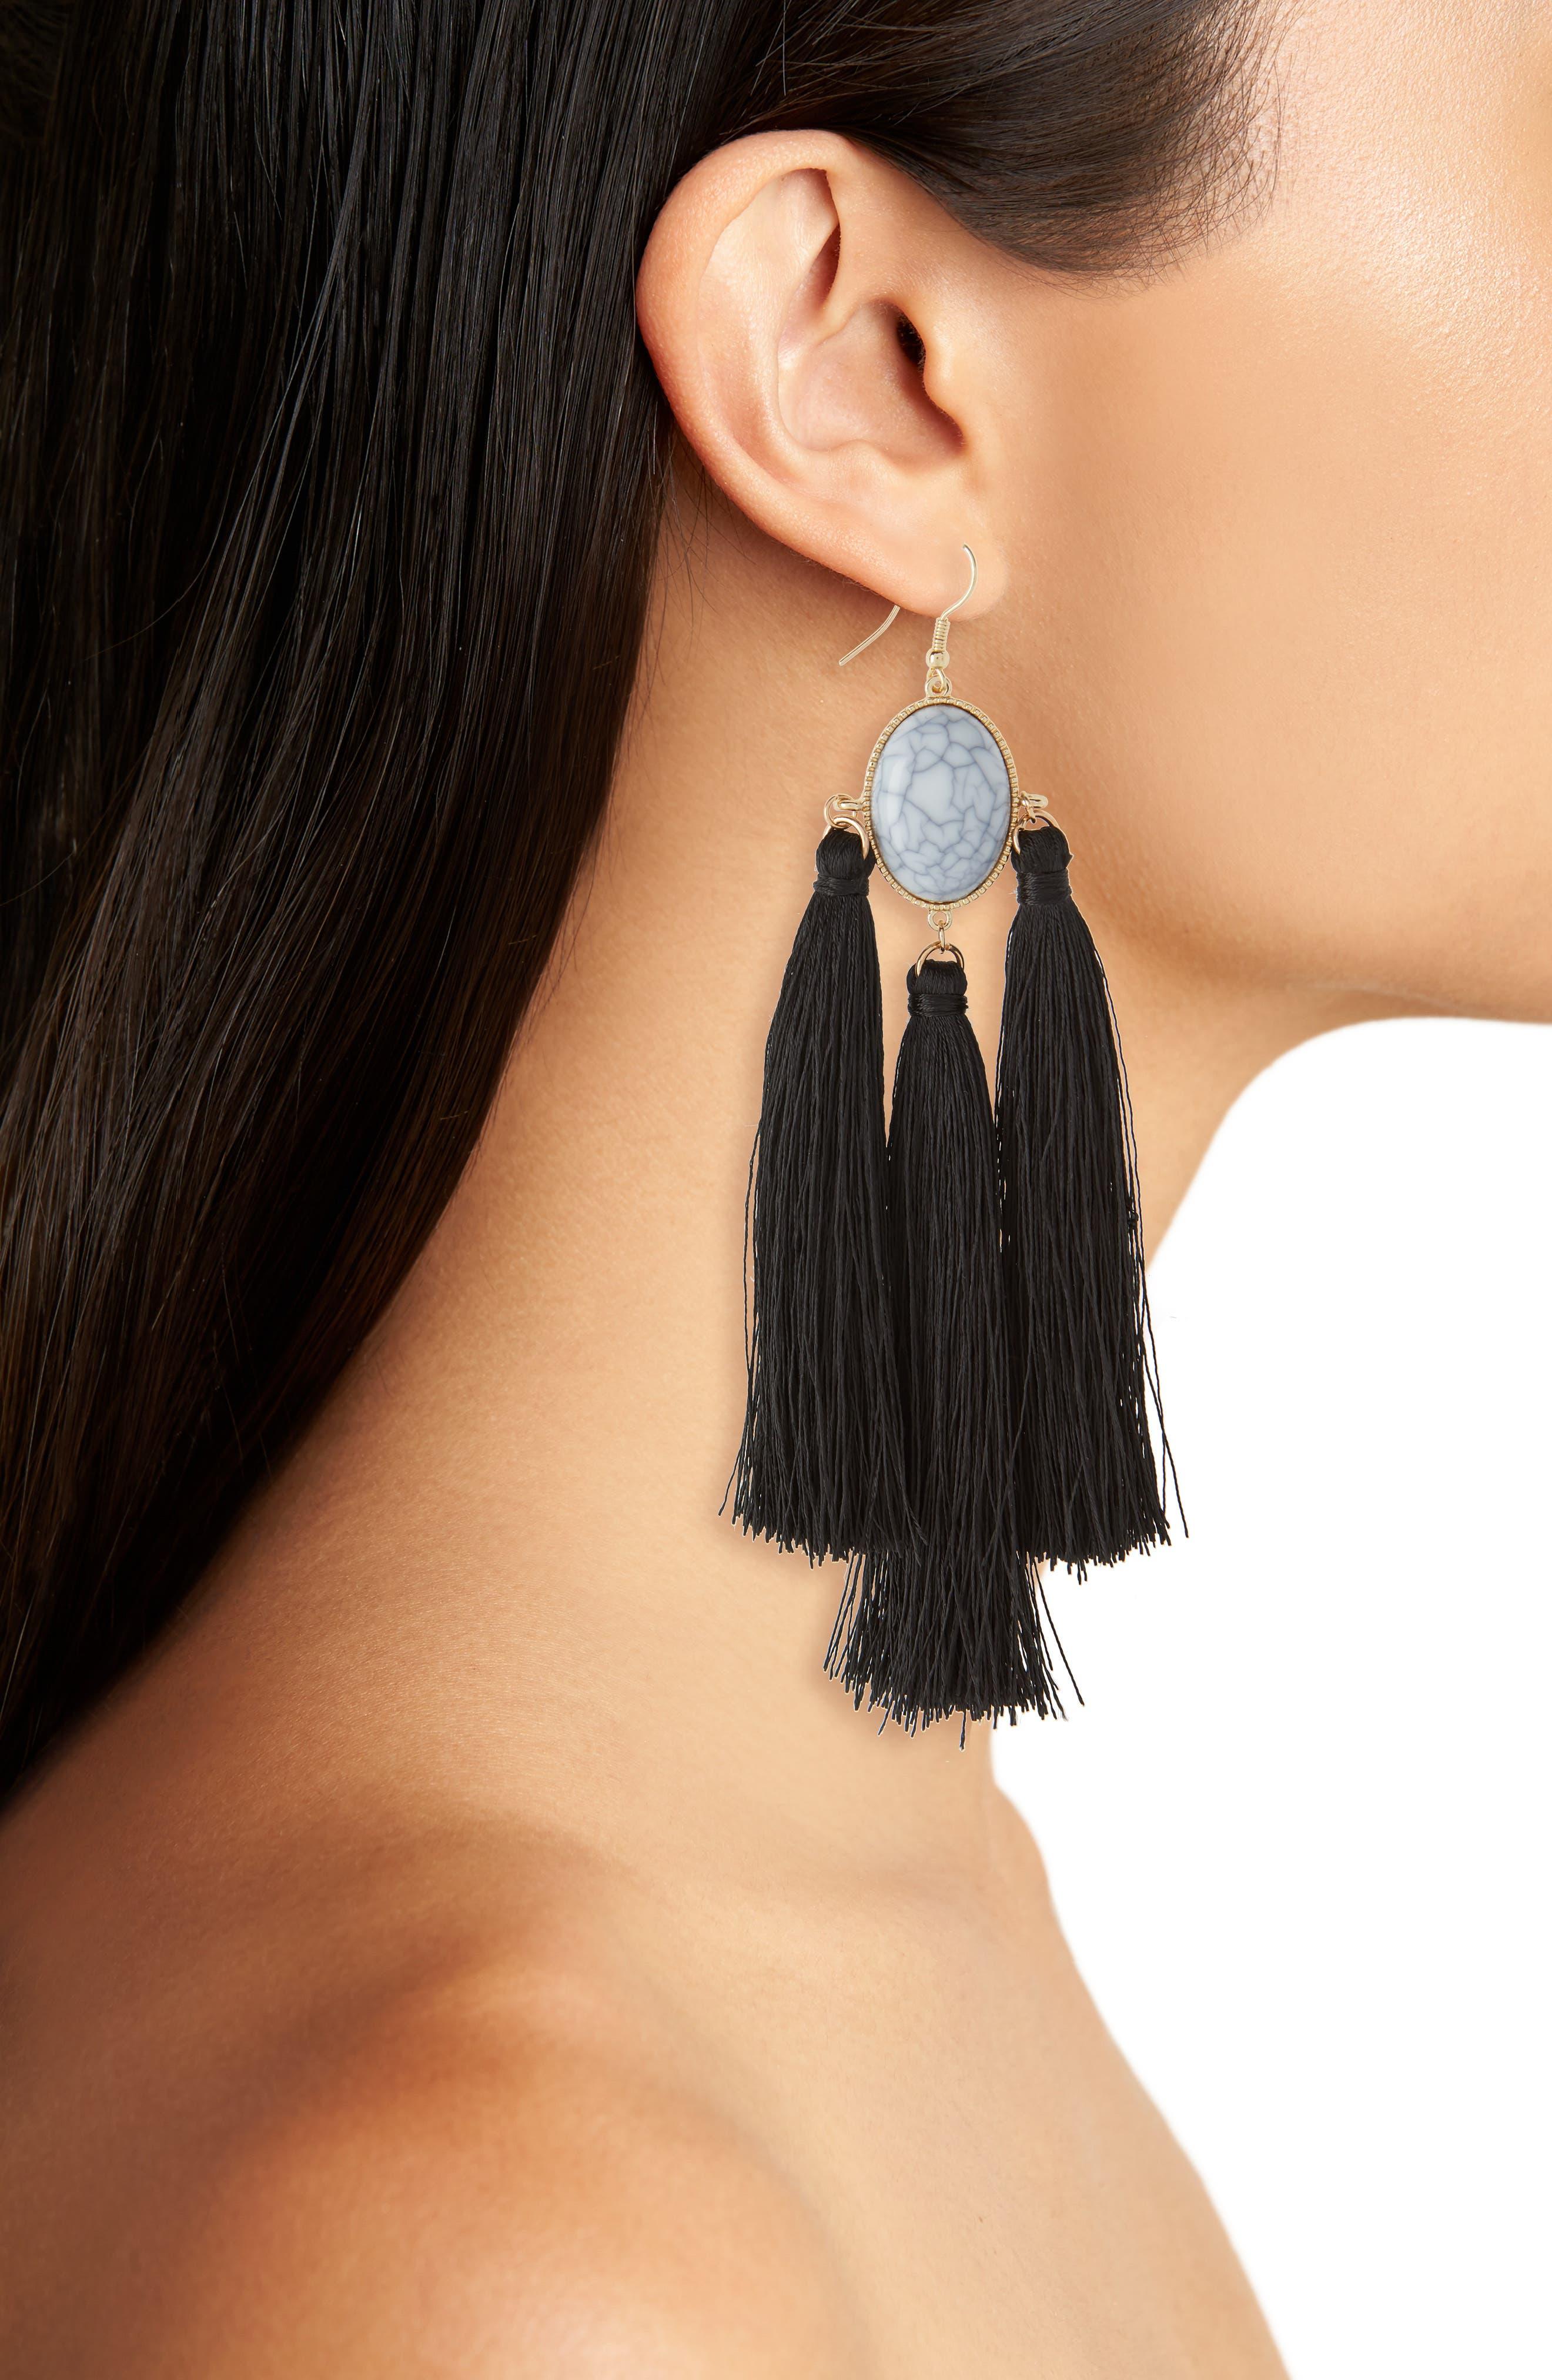 Marbled Bead & Tassel Earrings,                             Alternate thumbnail 2, color,                             Marble/ Black